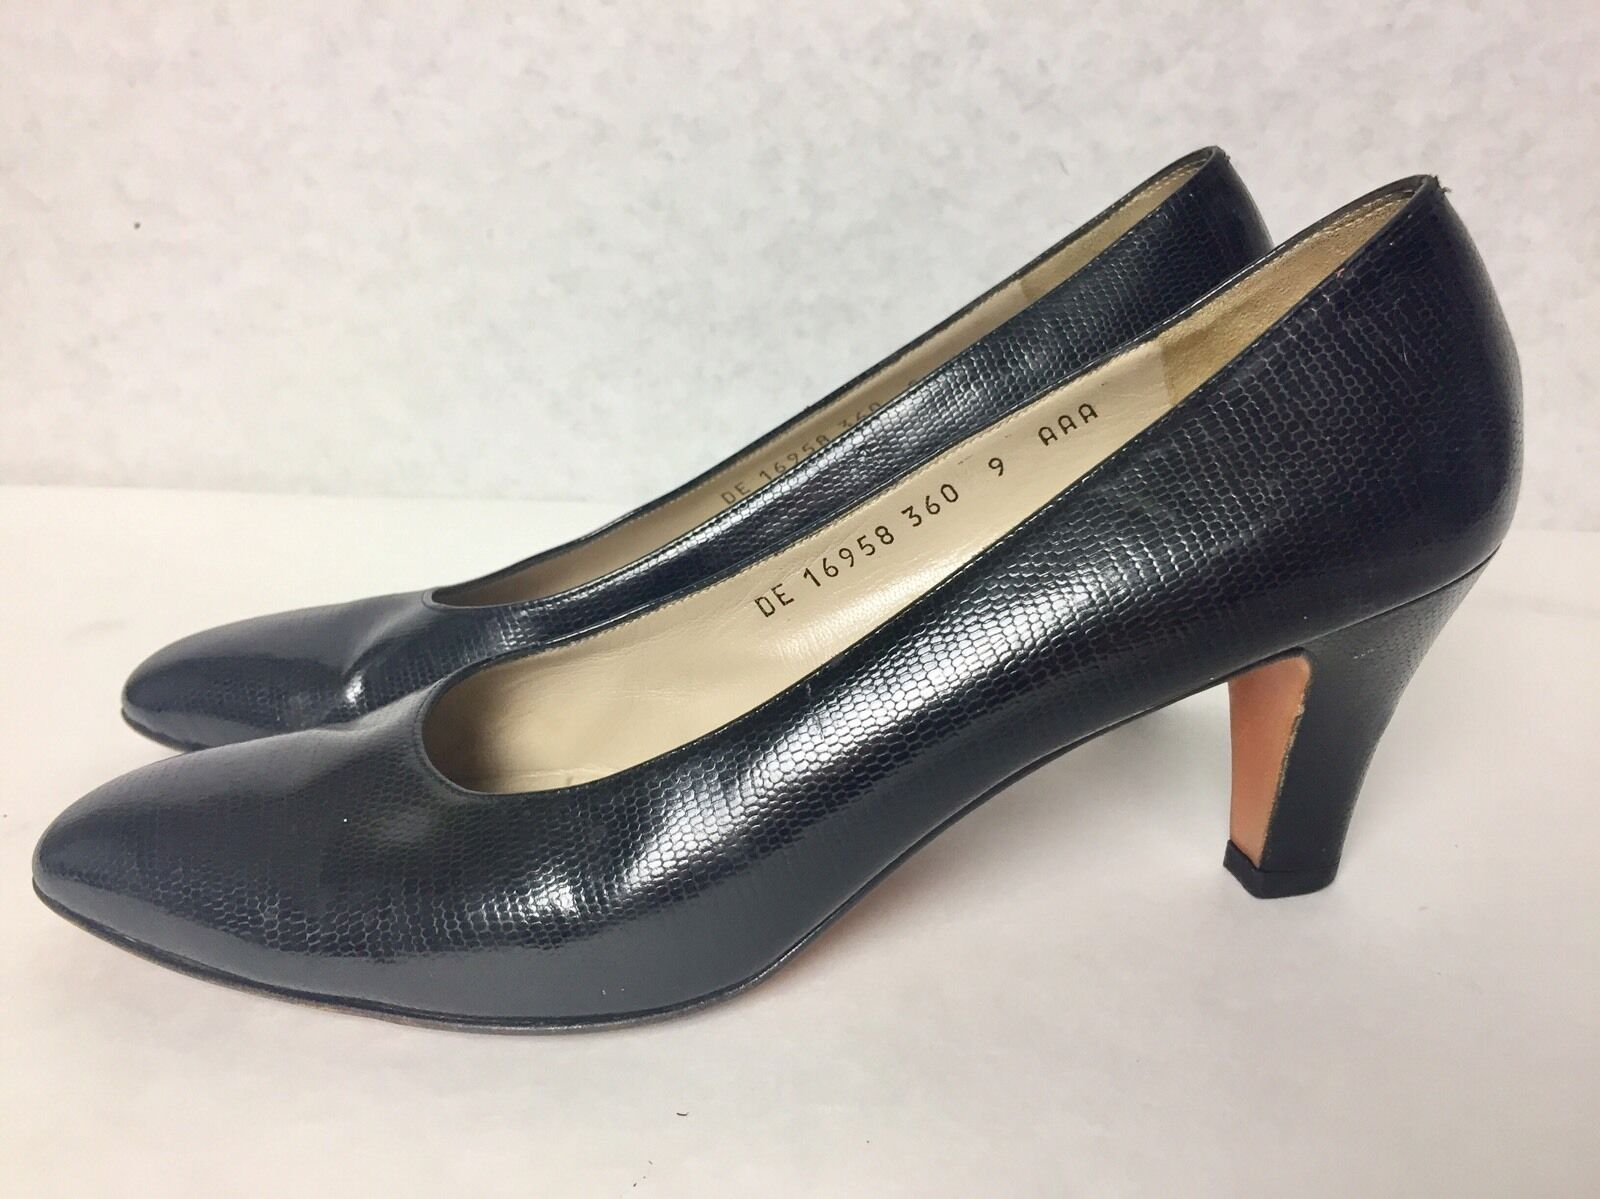 VINTAGE SALVATORE in FERRAGAMO made in SALVATORE  snakeskin heels Größe 9 AAA 3  Heel af124a